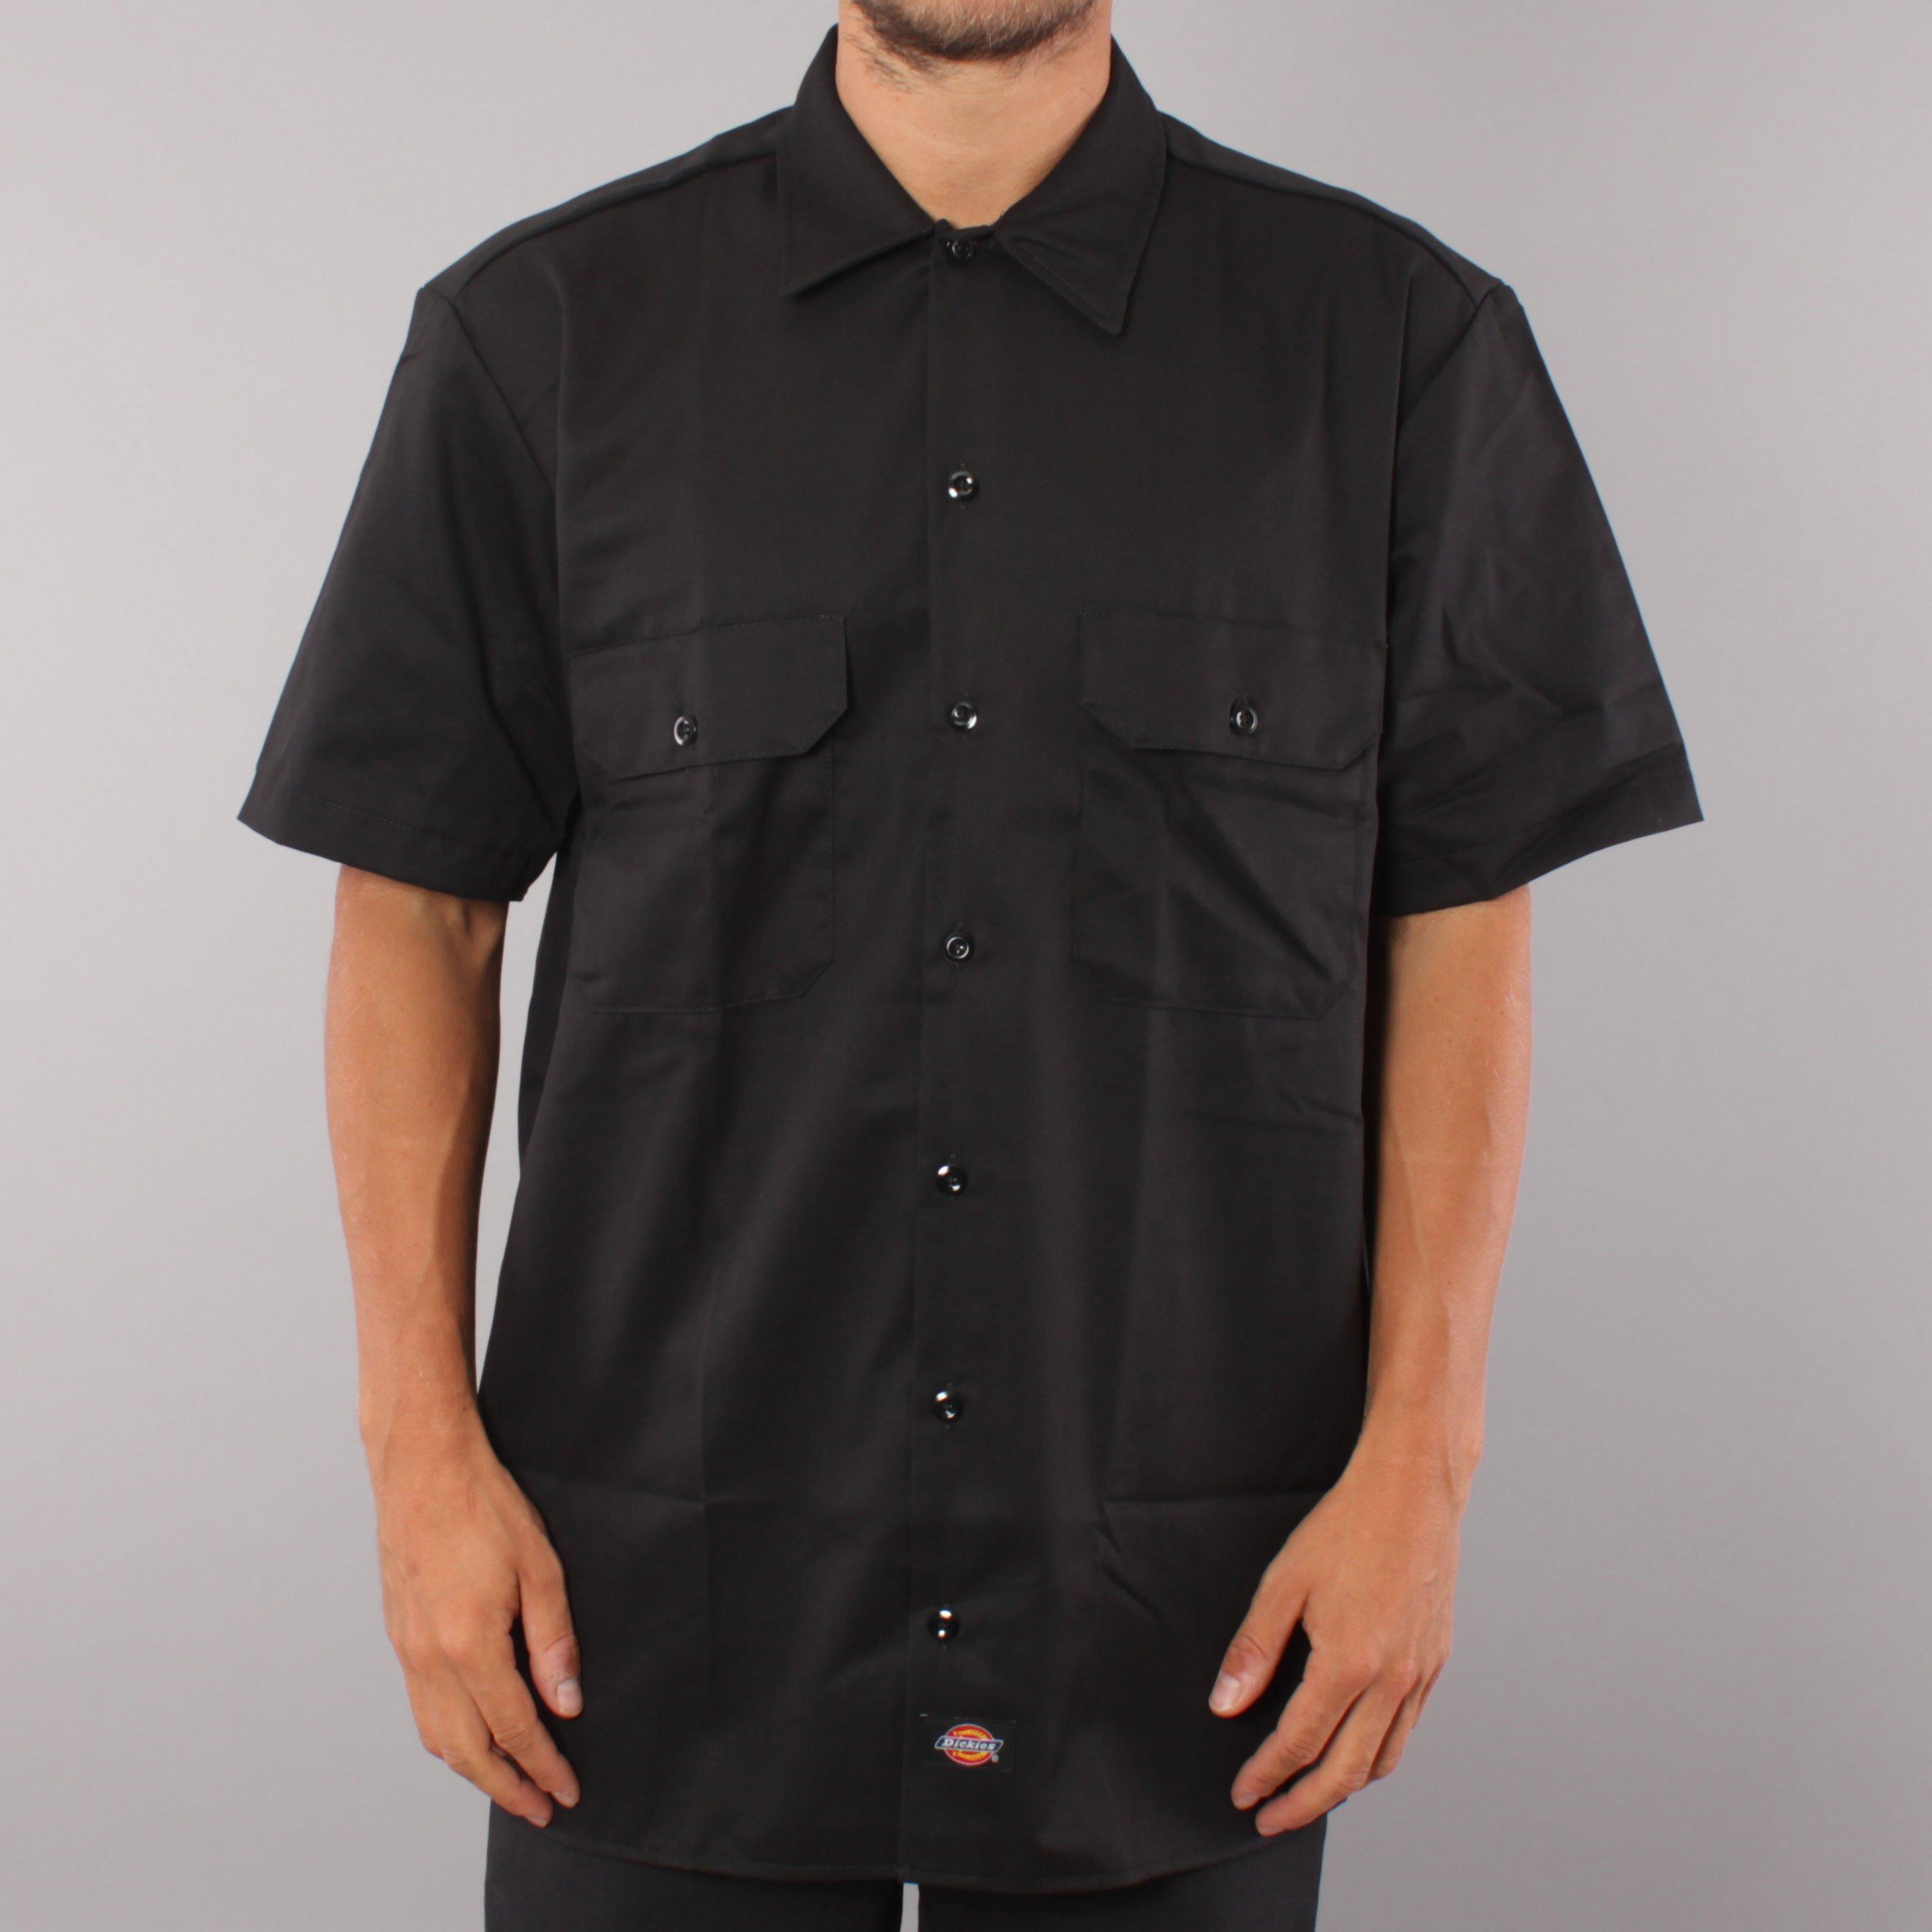 Dickies ss Work Shirt - Black